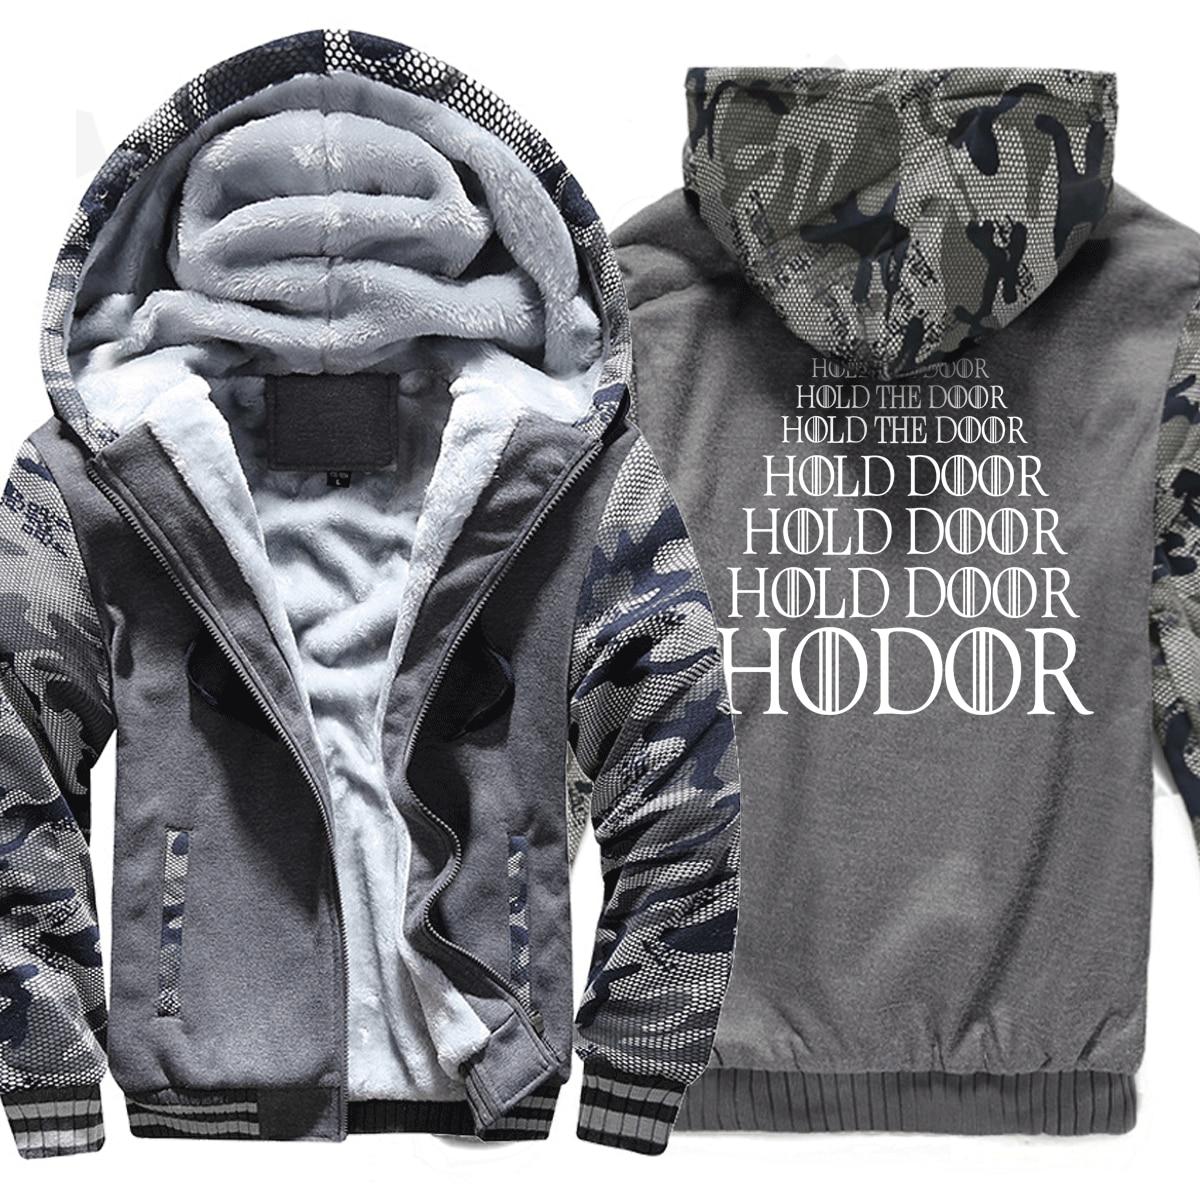 Game of Thrones HODOR Print fashion men hoodies funny 2019 winter sweatshirts Men's sweatshirts tracksuit hoody Hipster Hip Hop